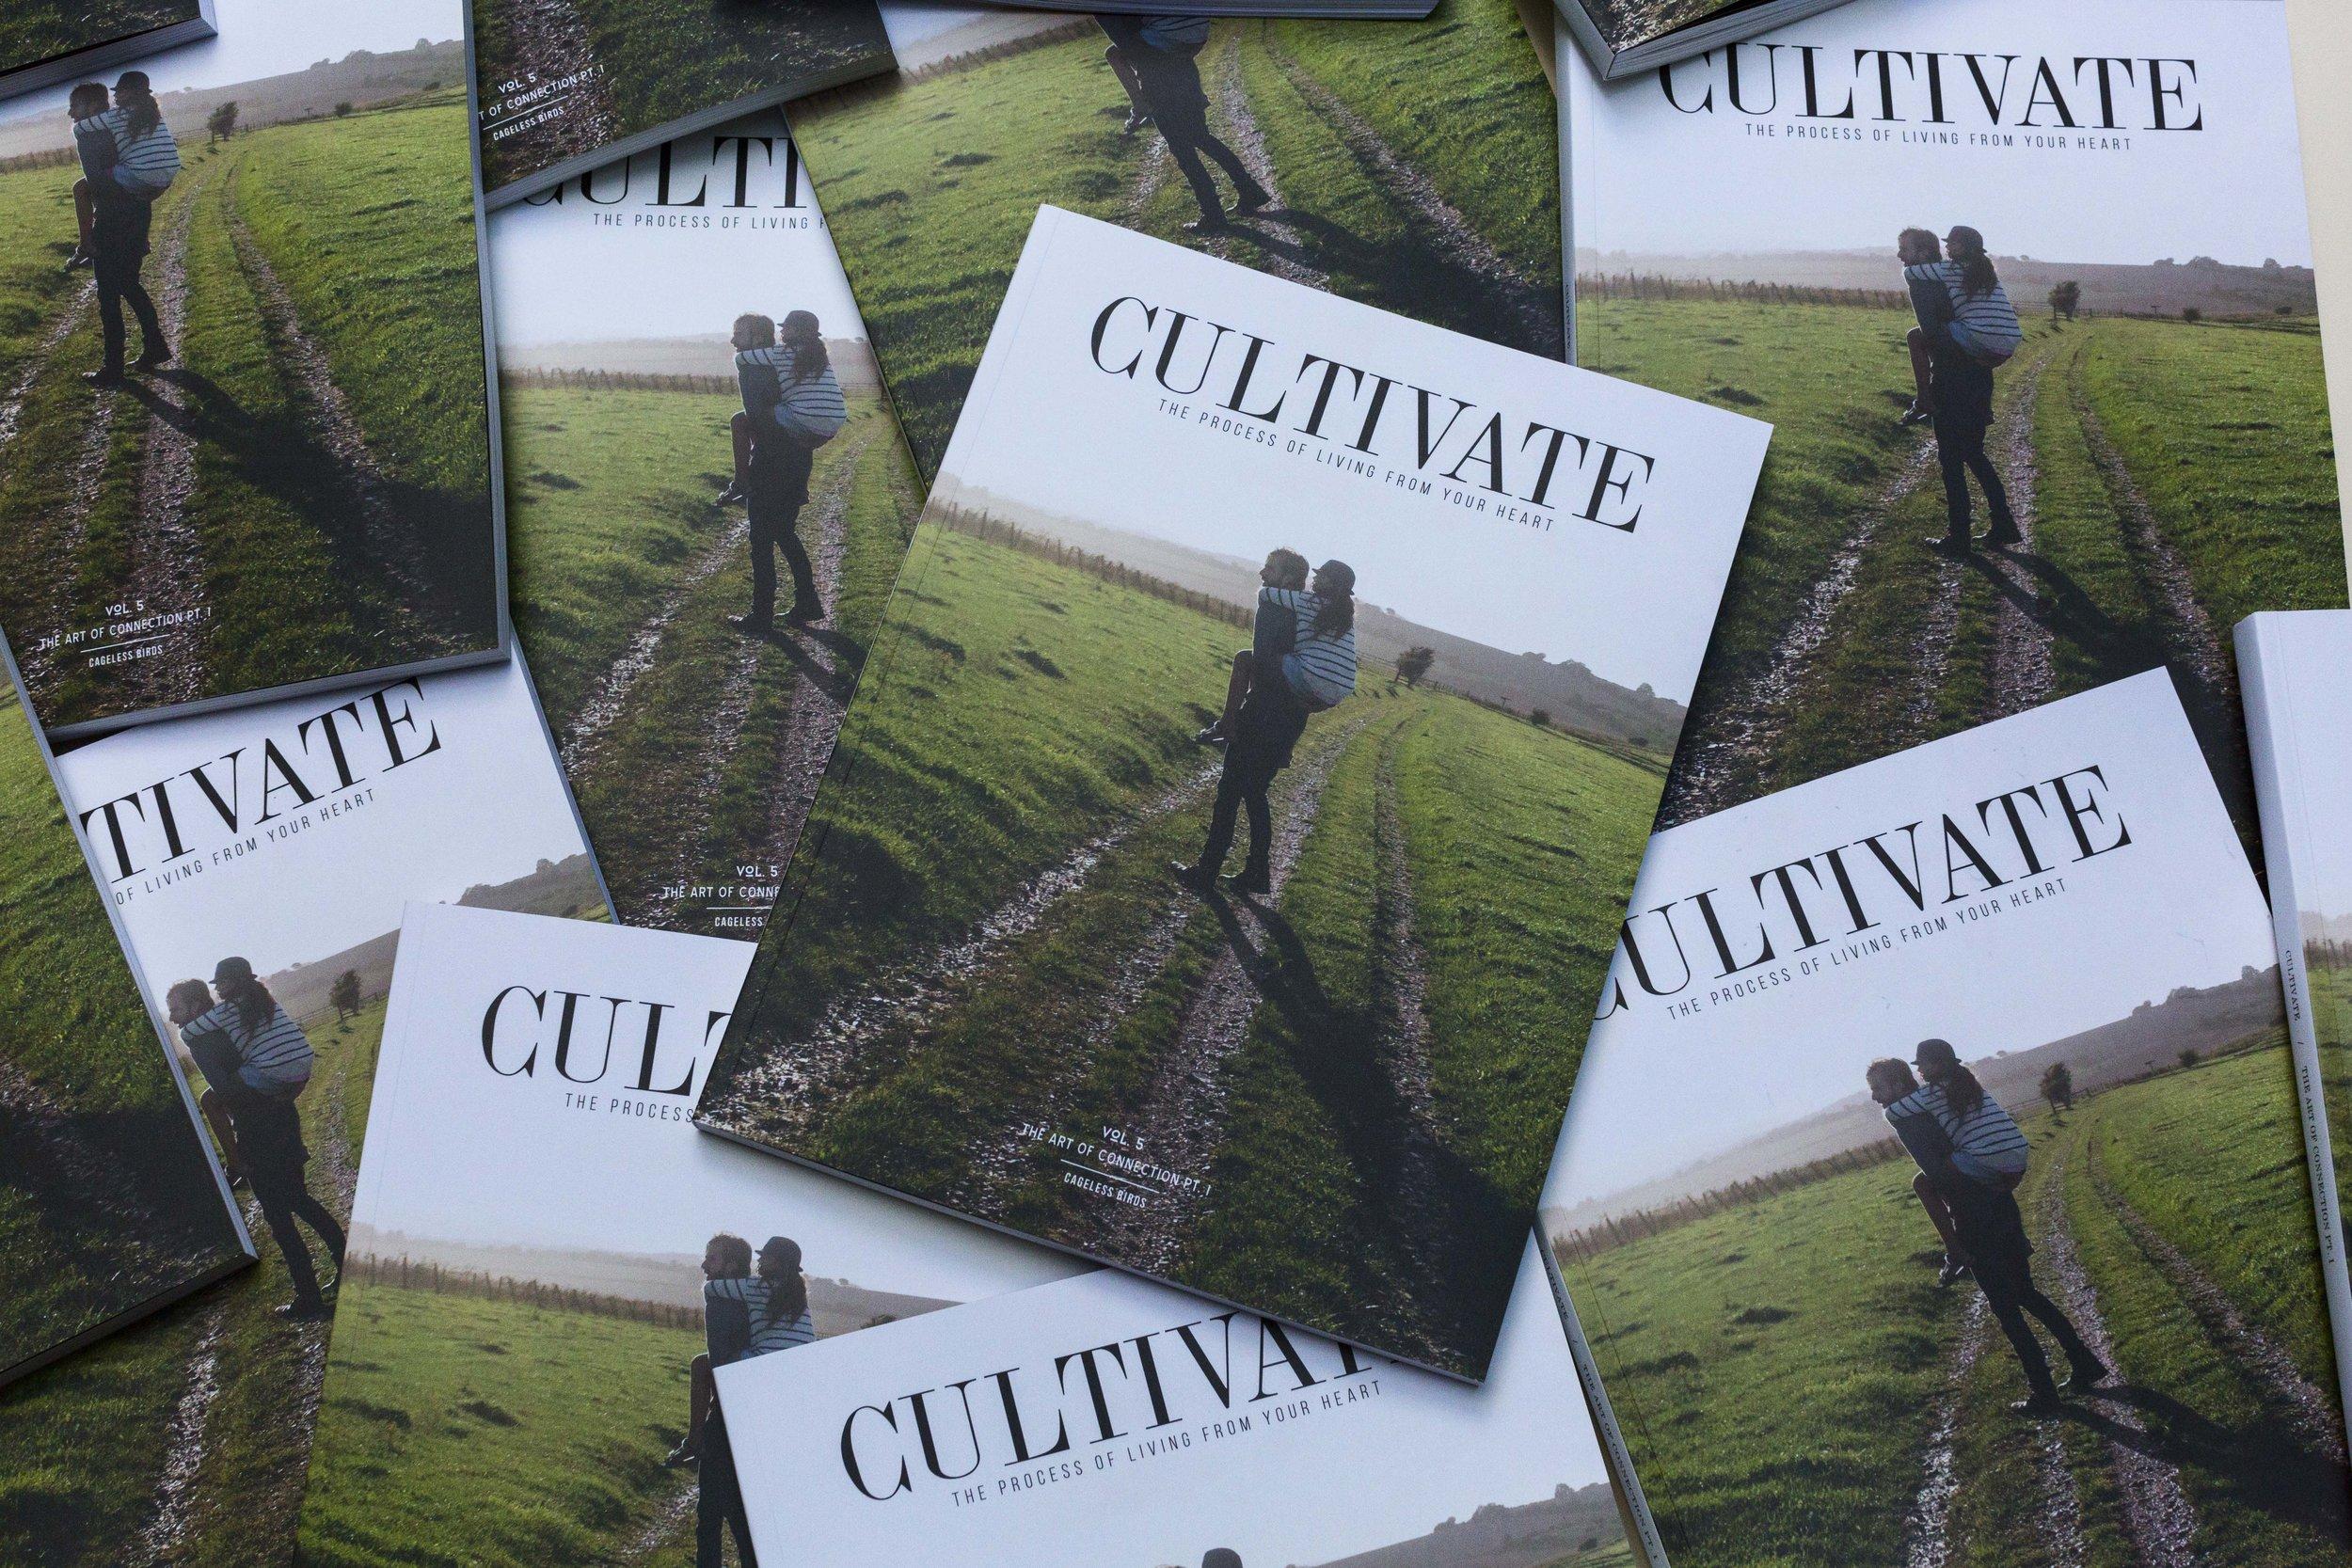 cultivate_volv_cover_01_2.jpg